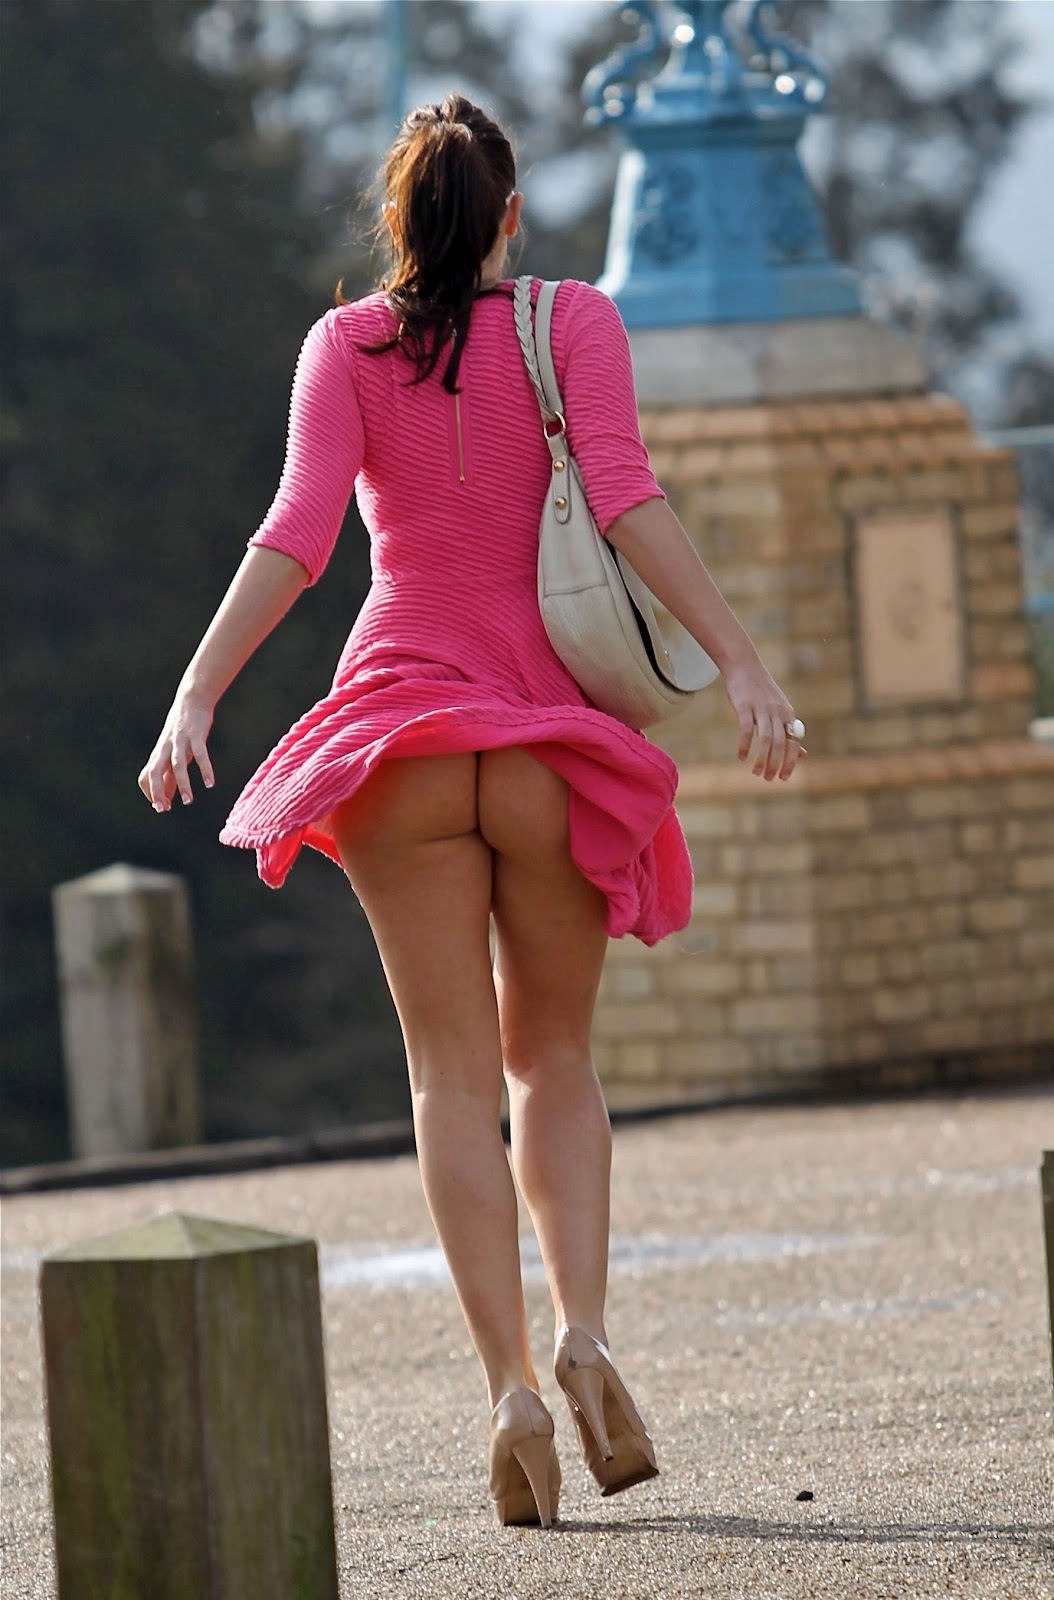 Karolina kurkovas windy panty upskirt, Nude hot pics